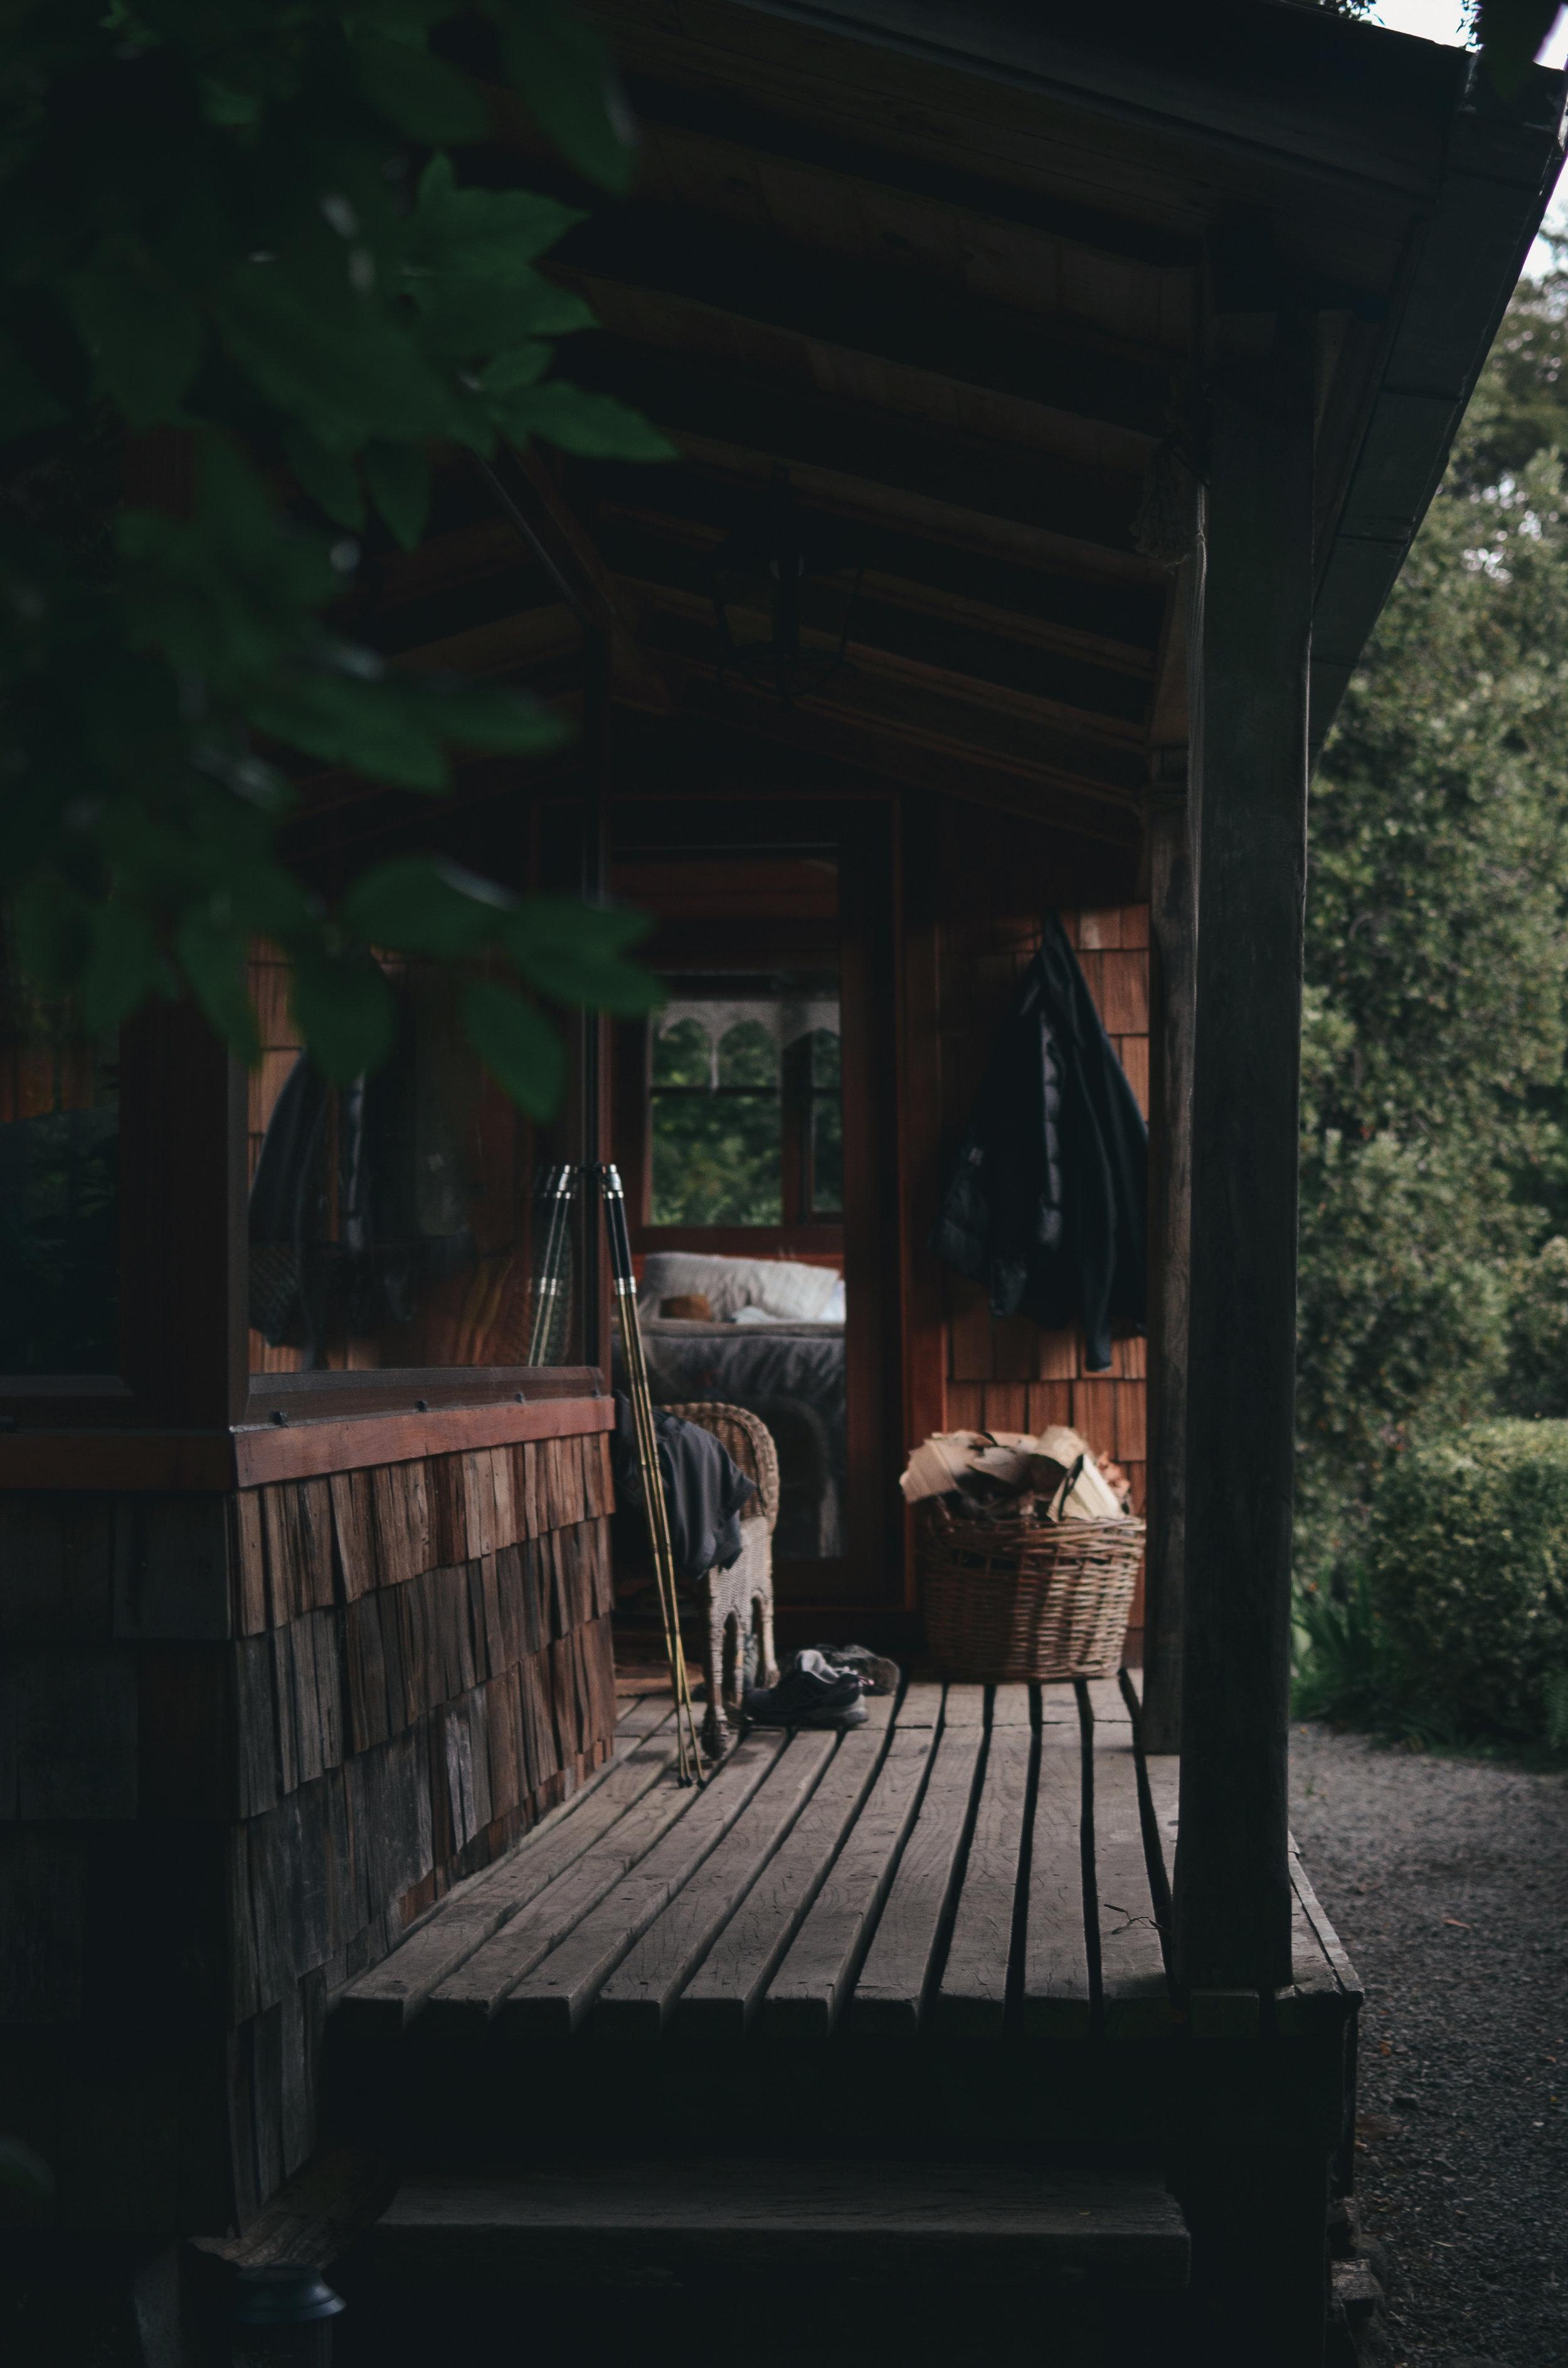 barraco+lodge+chile+life+on+pine+travel+blog+life+on+pine_DSC_1619.jpg